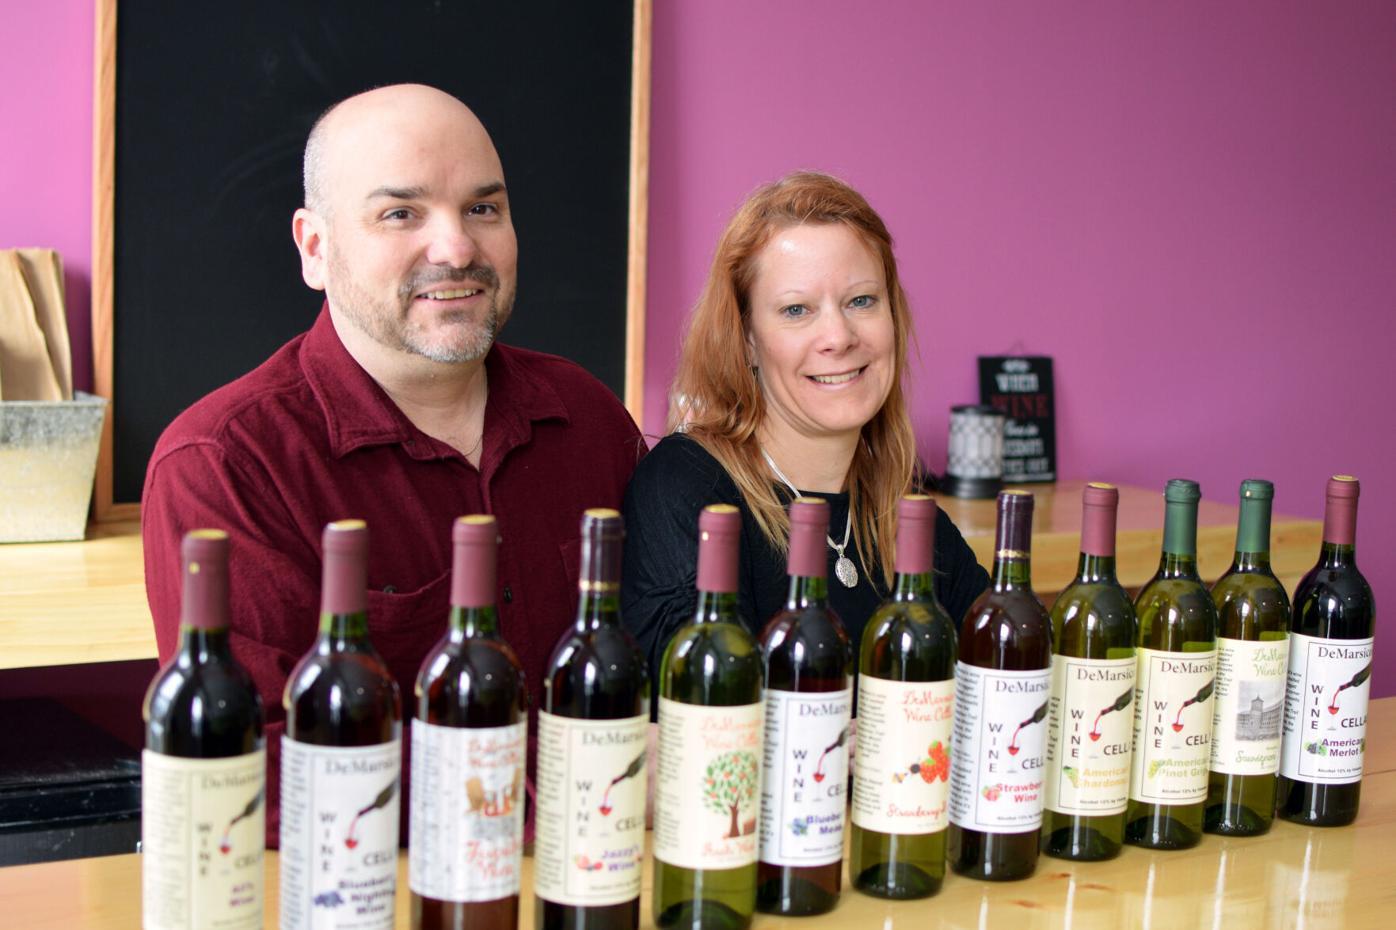 DeMarsico's Wine Cellar